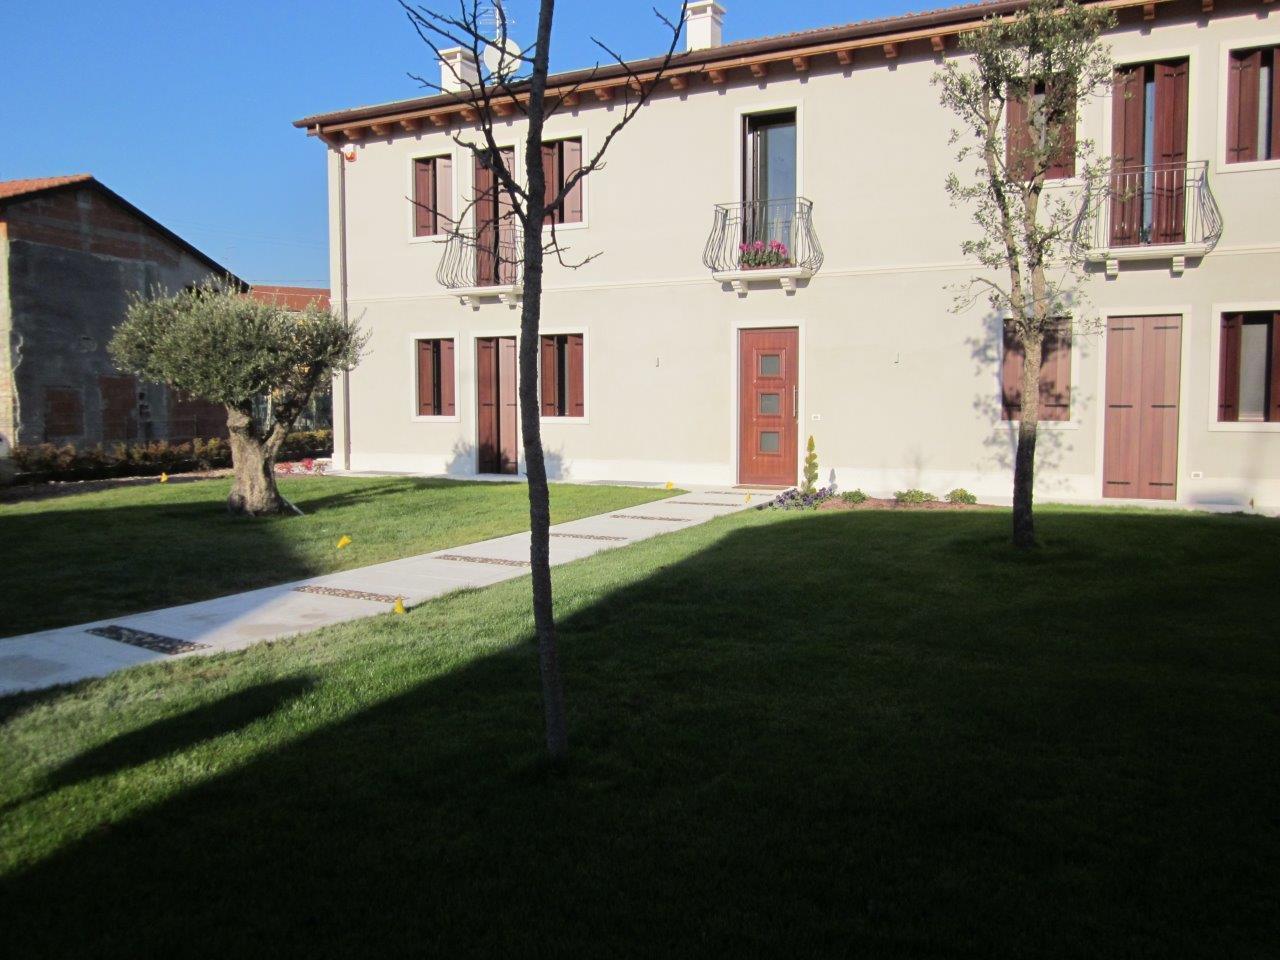 Ingresso Casa Esterno In Pietra pietra di prun a tezze di arzignano (vicenza): una